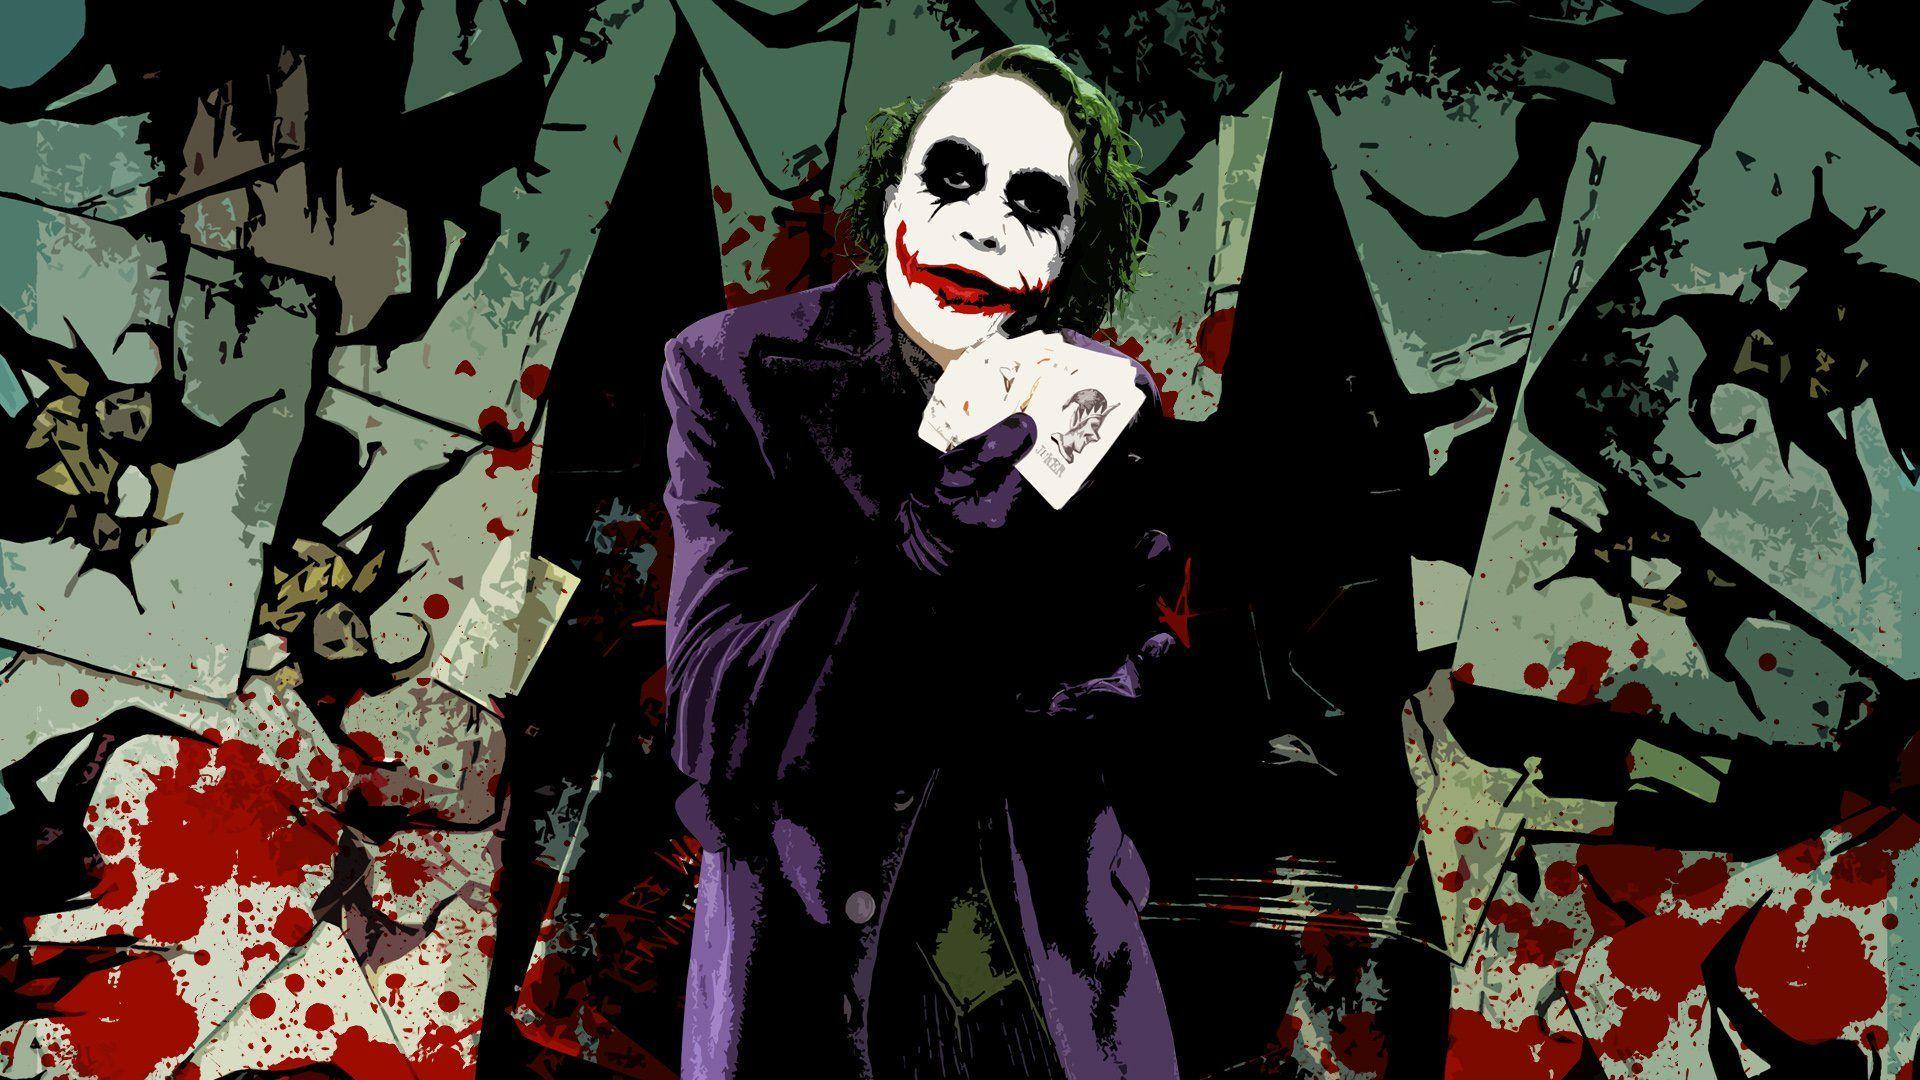 The Joker HD Wallpapers 1080p - Wallpaper Cave